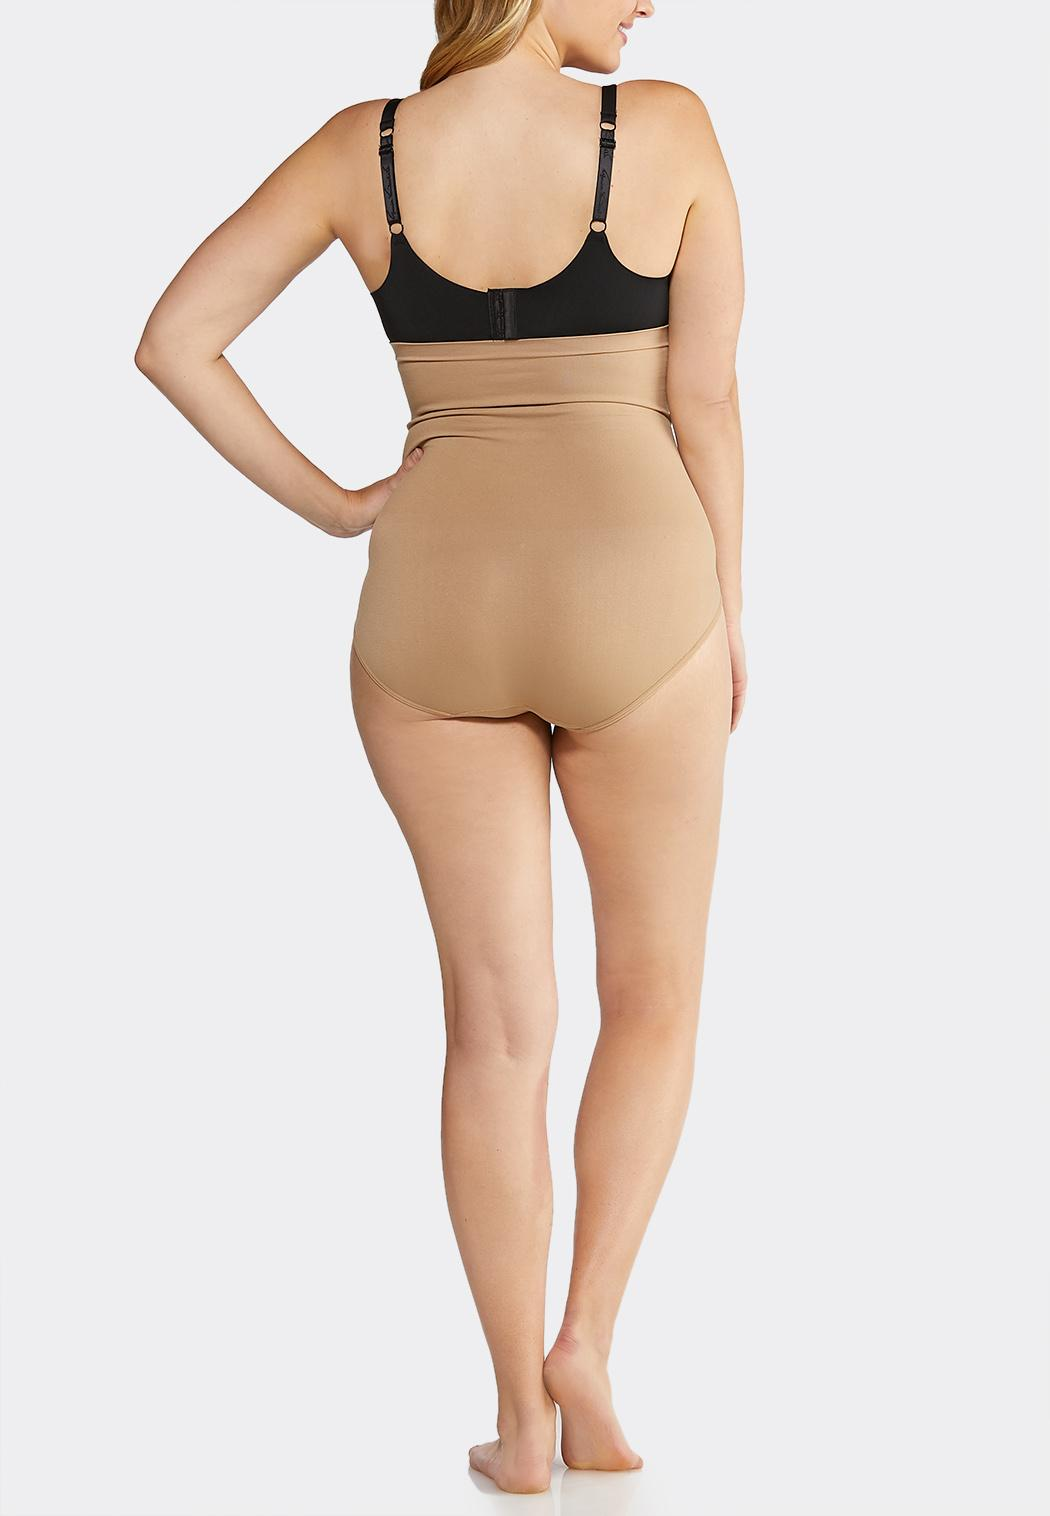 Plus Size Nude High Waist Seamless Panties (Item #41090127)